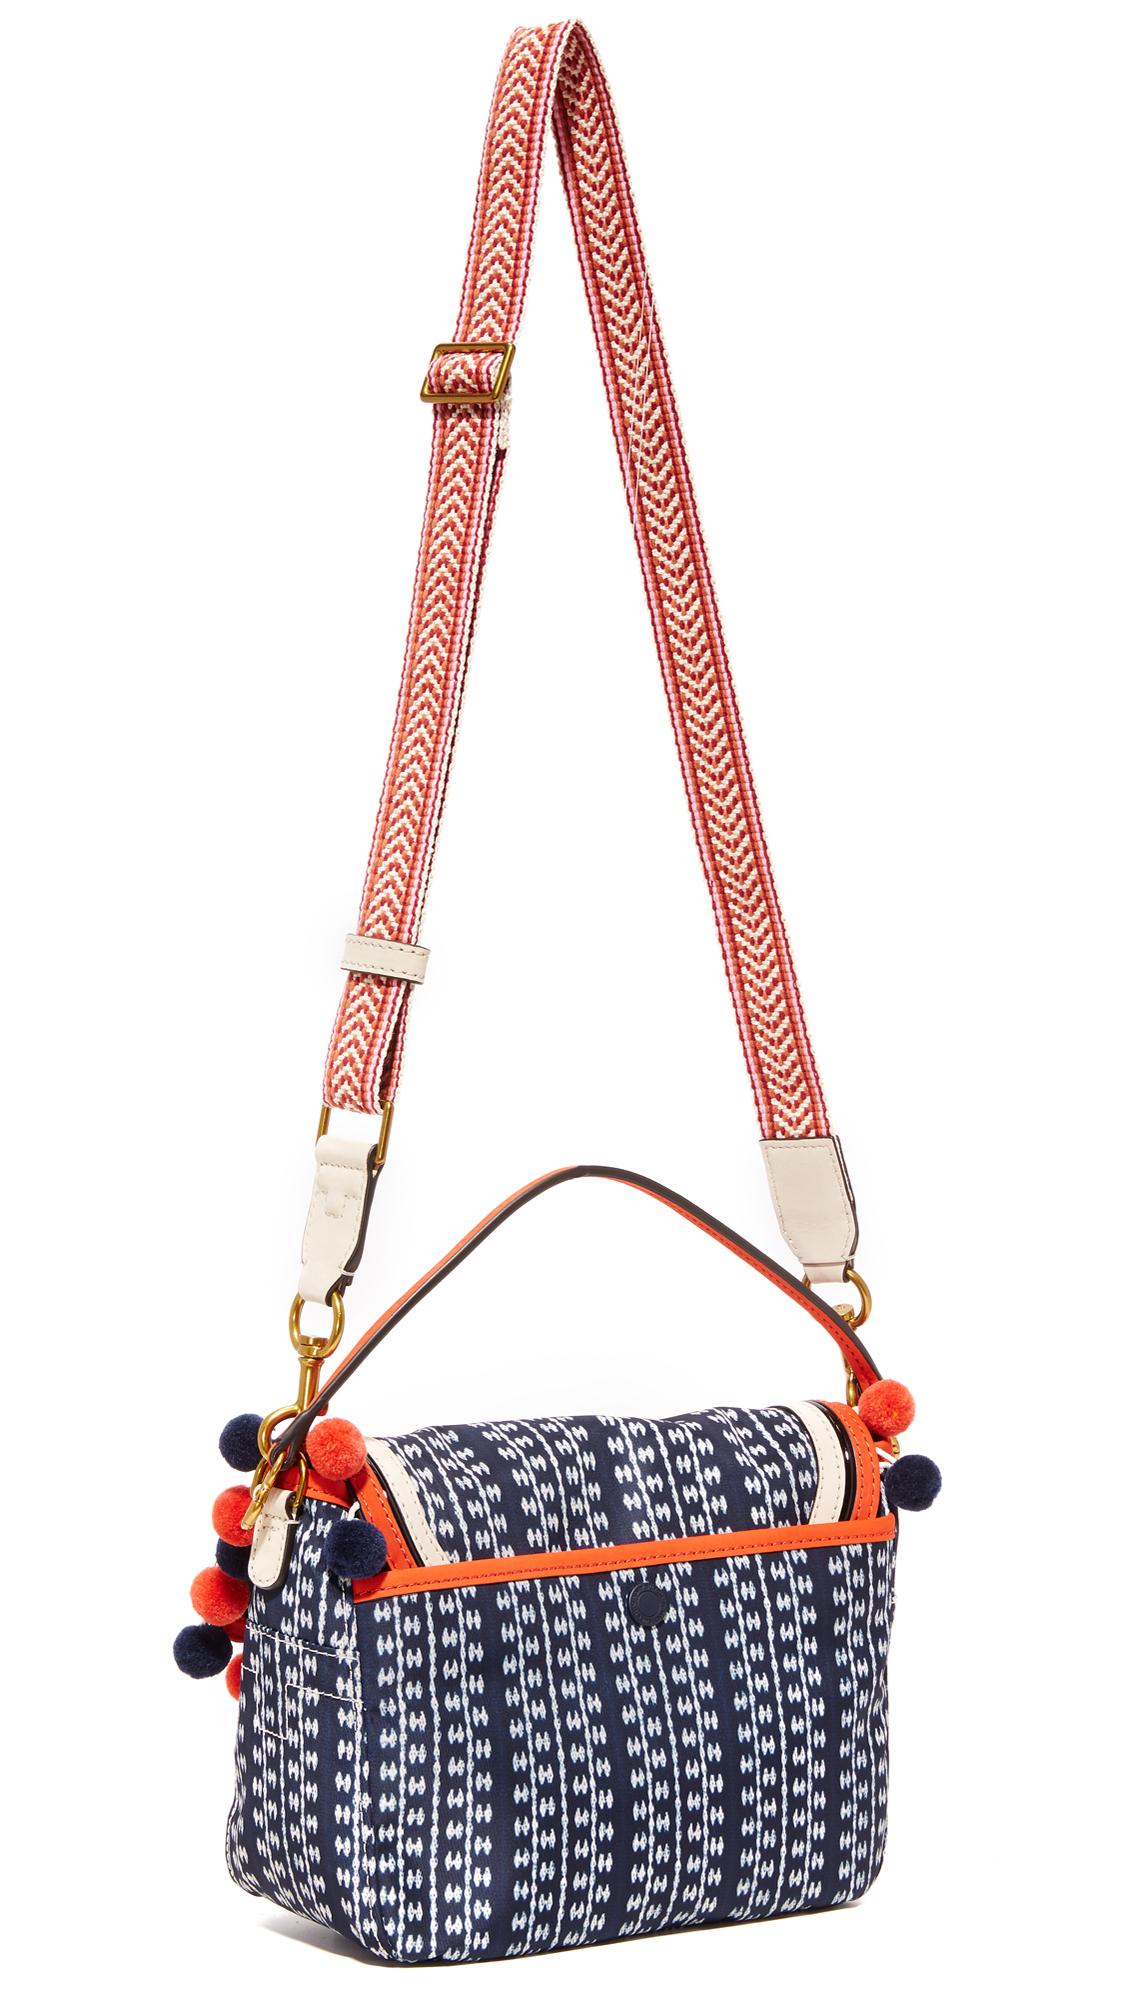 0001d3d73b4e Tory Burch Scout Nylon Pom Pom Cross Body Bag